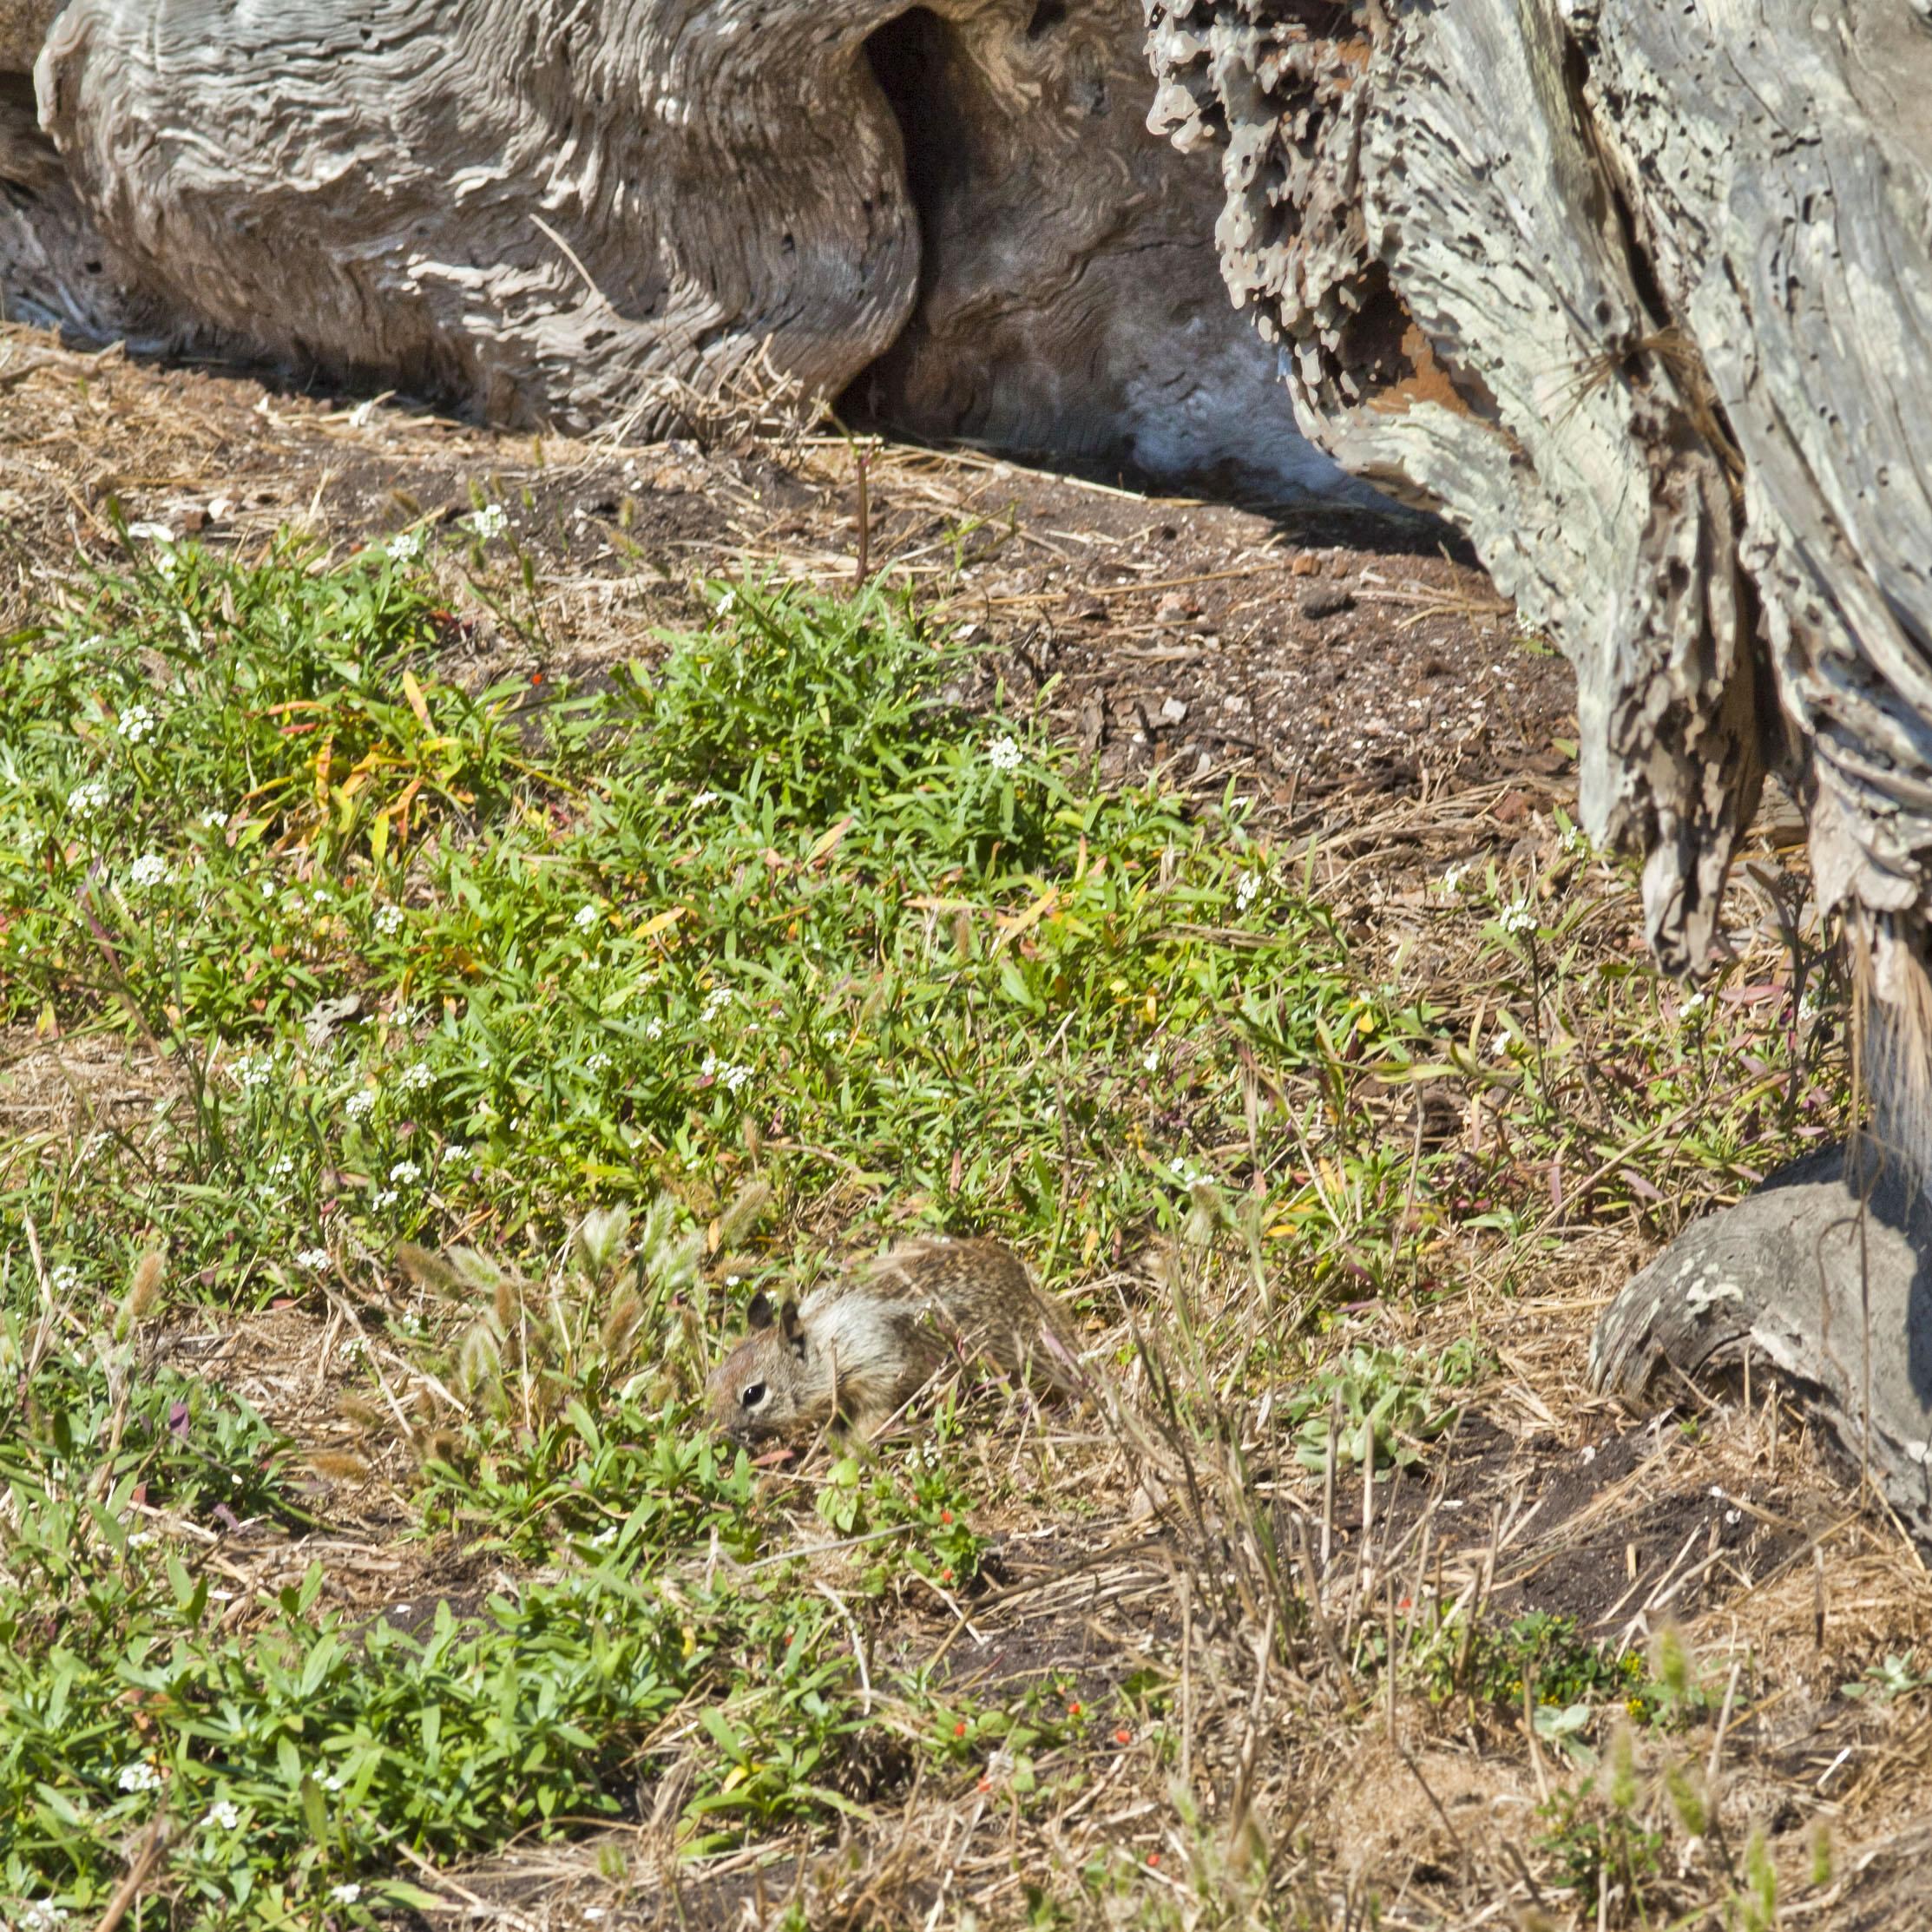 California ground squirrel Otospermophilus beecheyi 17 Mile Drive Monterey CA July 2011 07